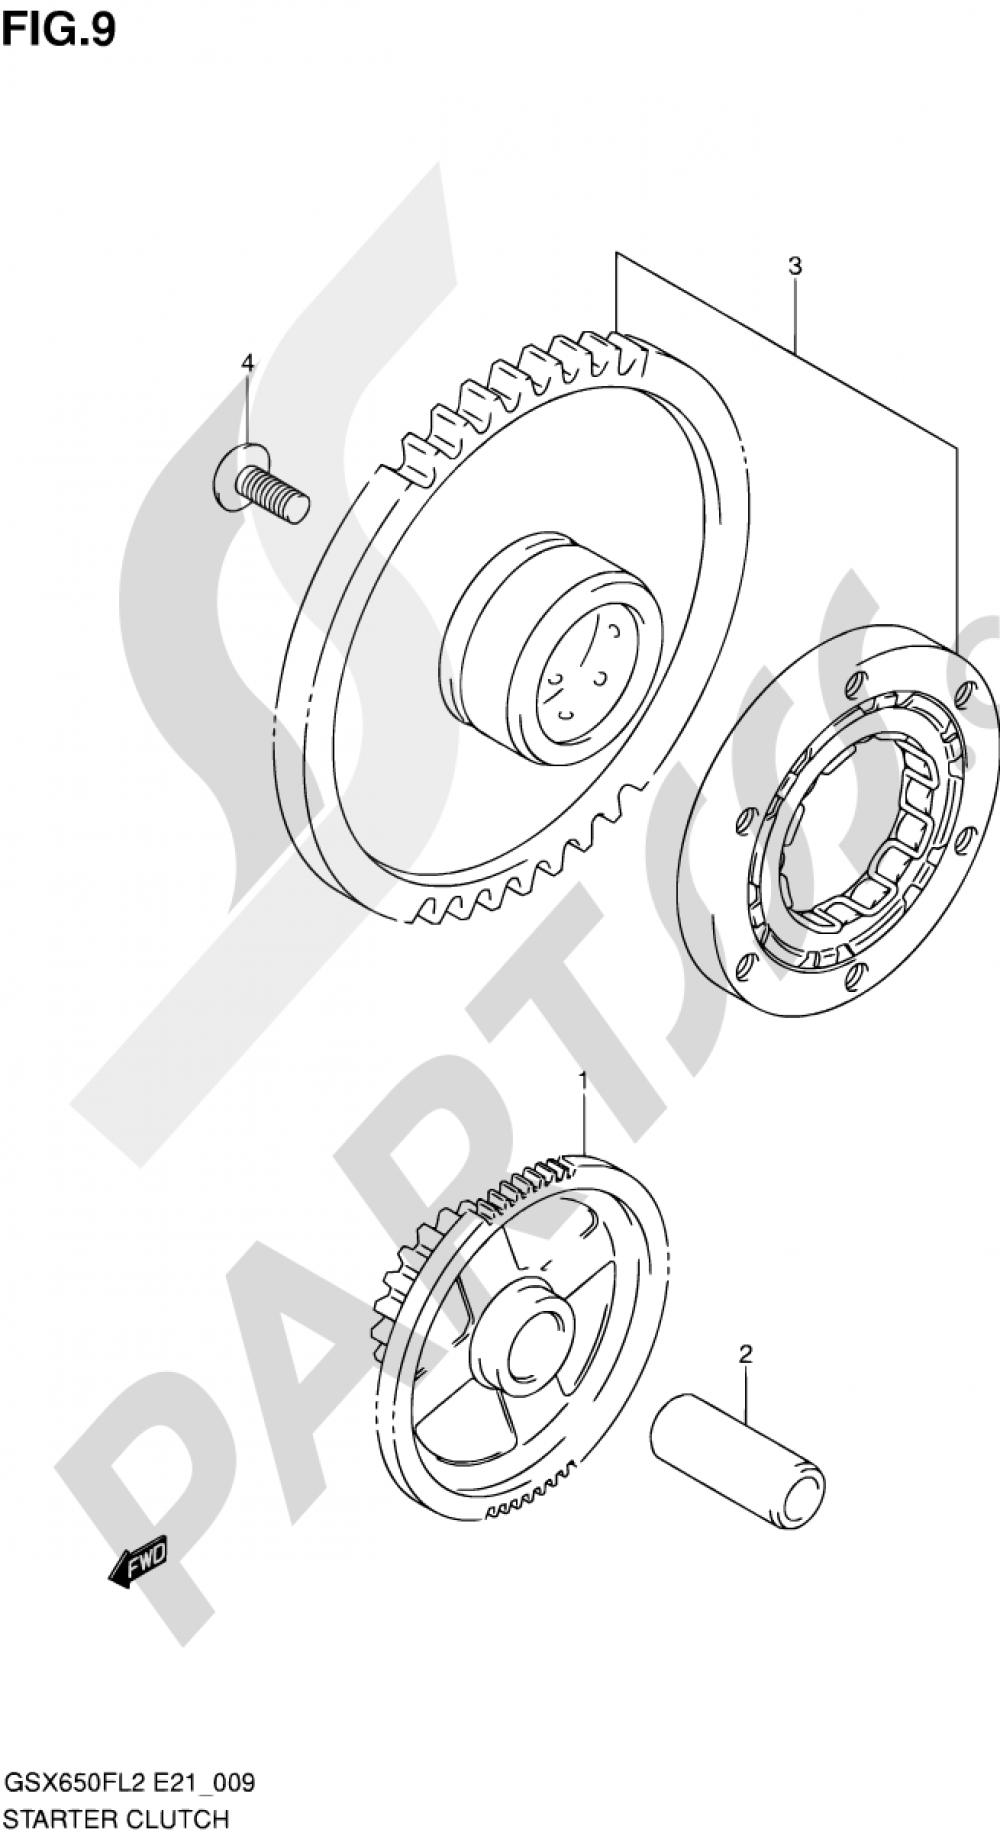 9 - STARTER CLUTCH Suzuki GSX650FA 2012